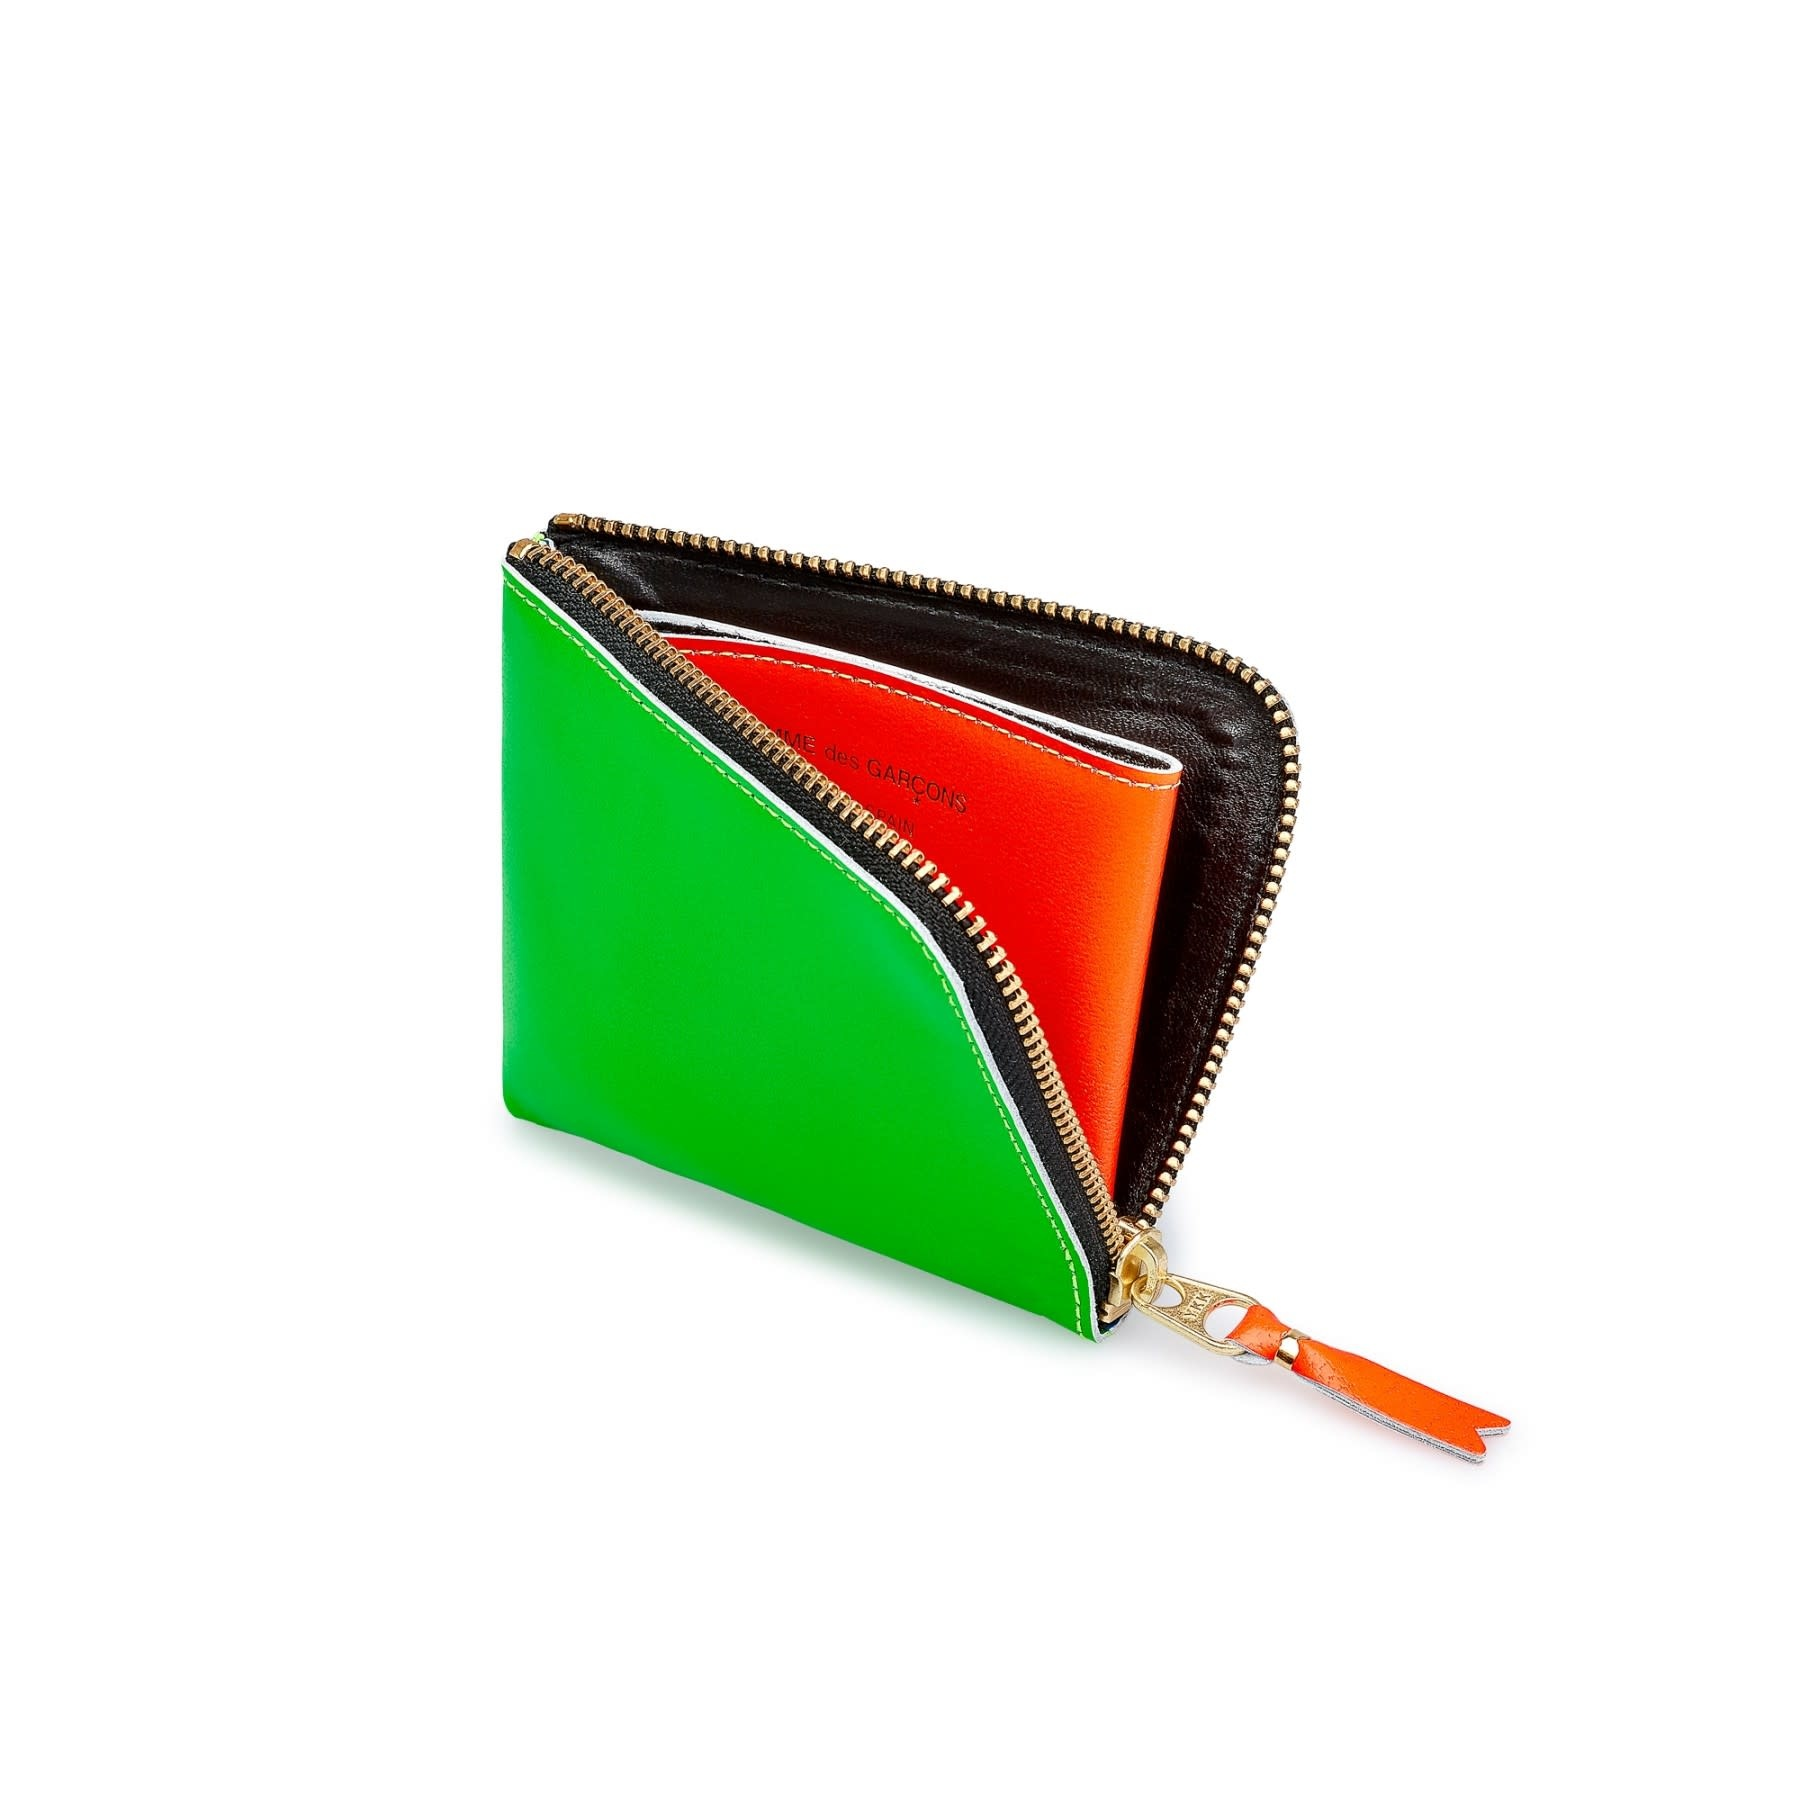 COMME des GARÇONS Wallet Comme des Garçons 1/2 Zip Wallet Neon Green/Orange SA3100SF